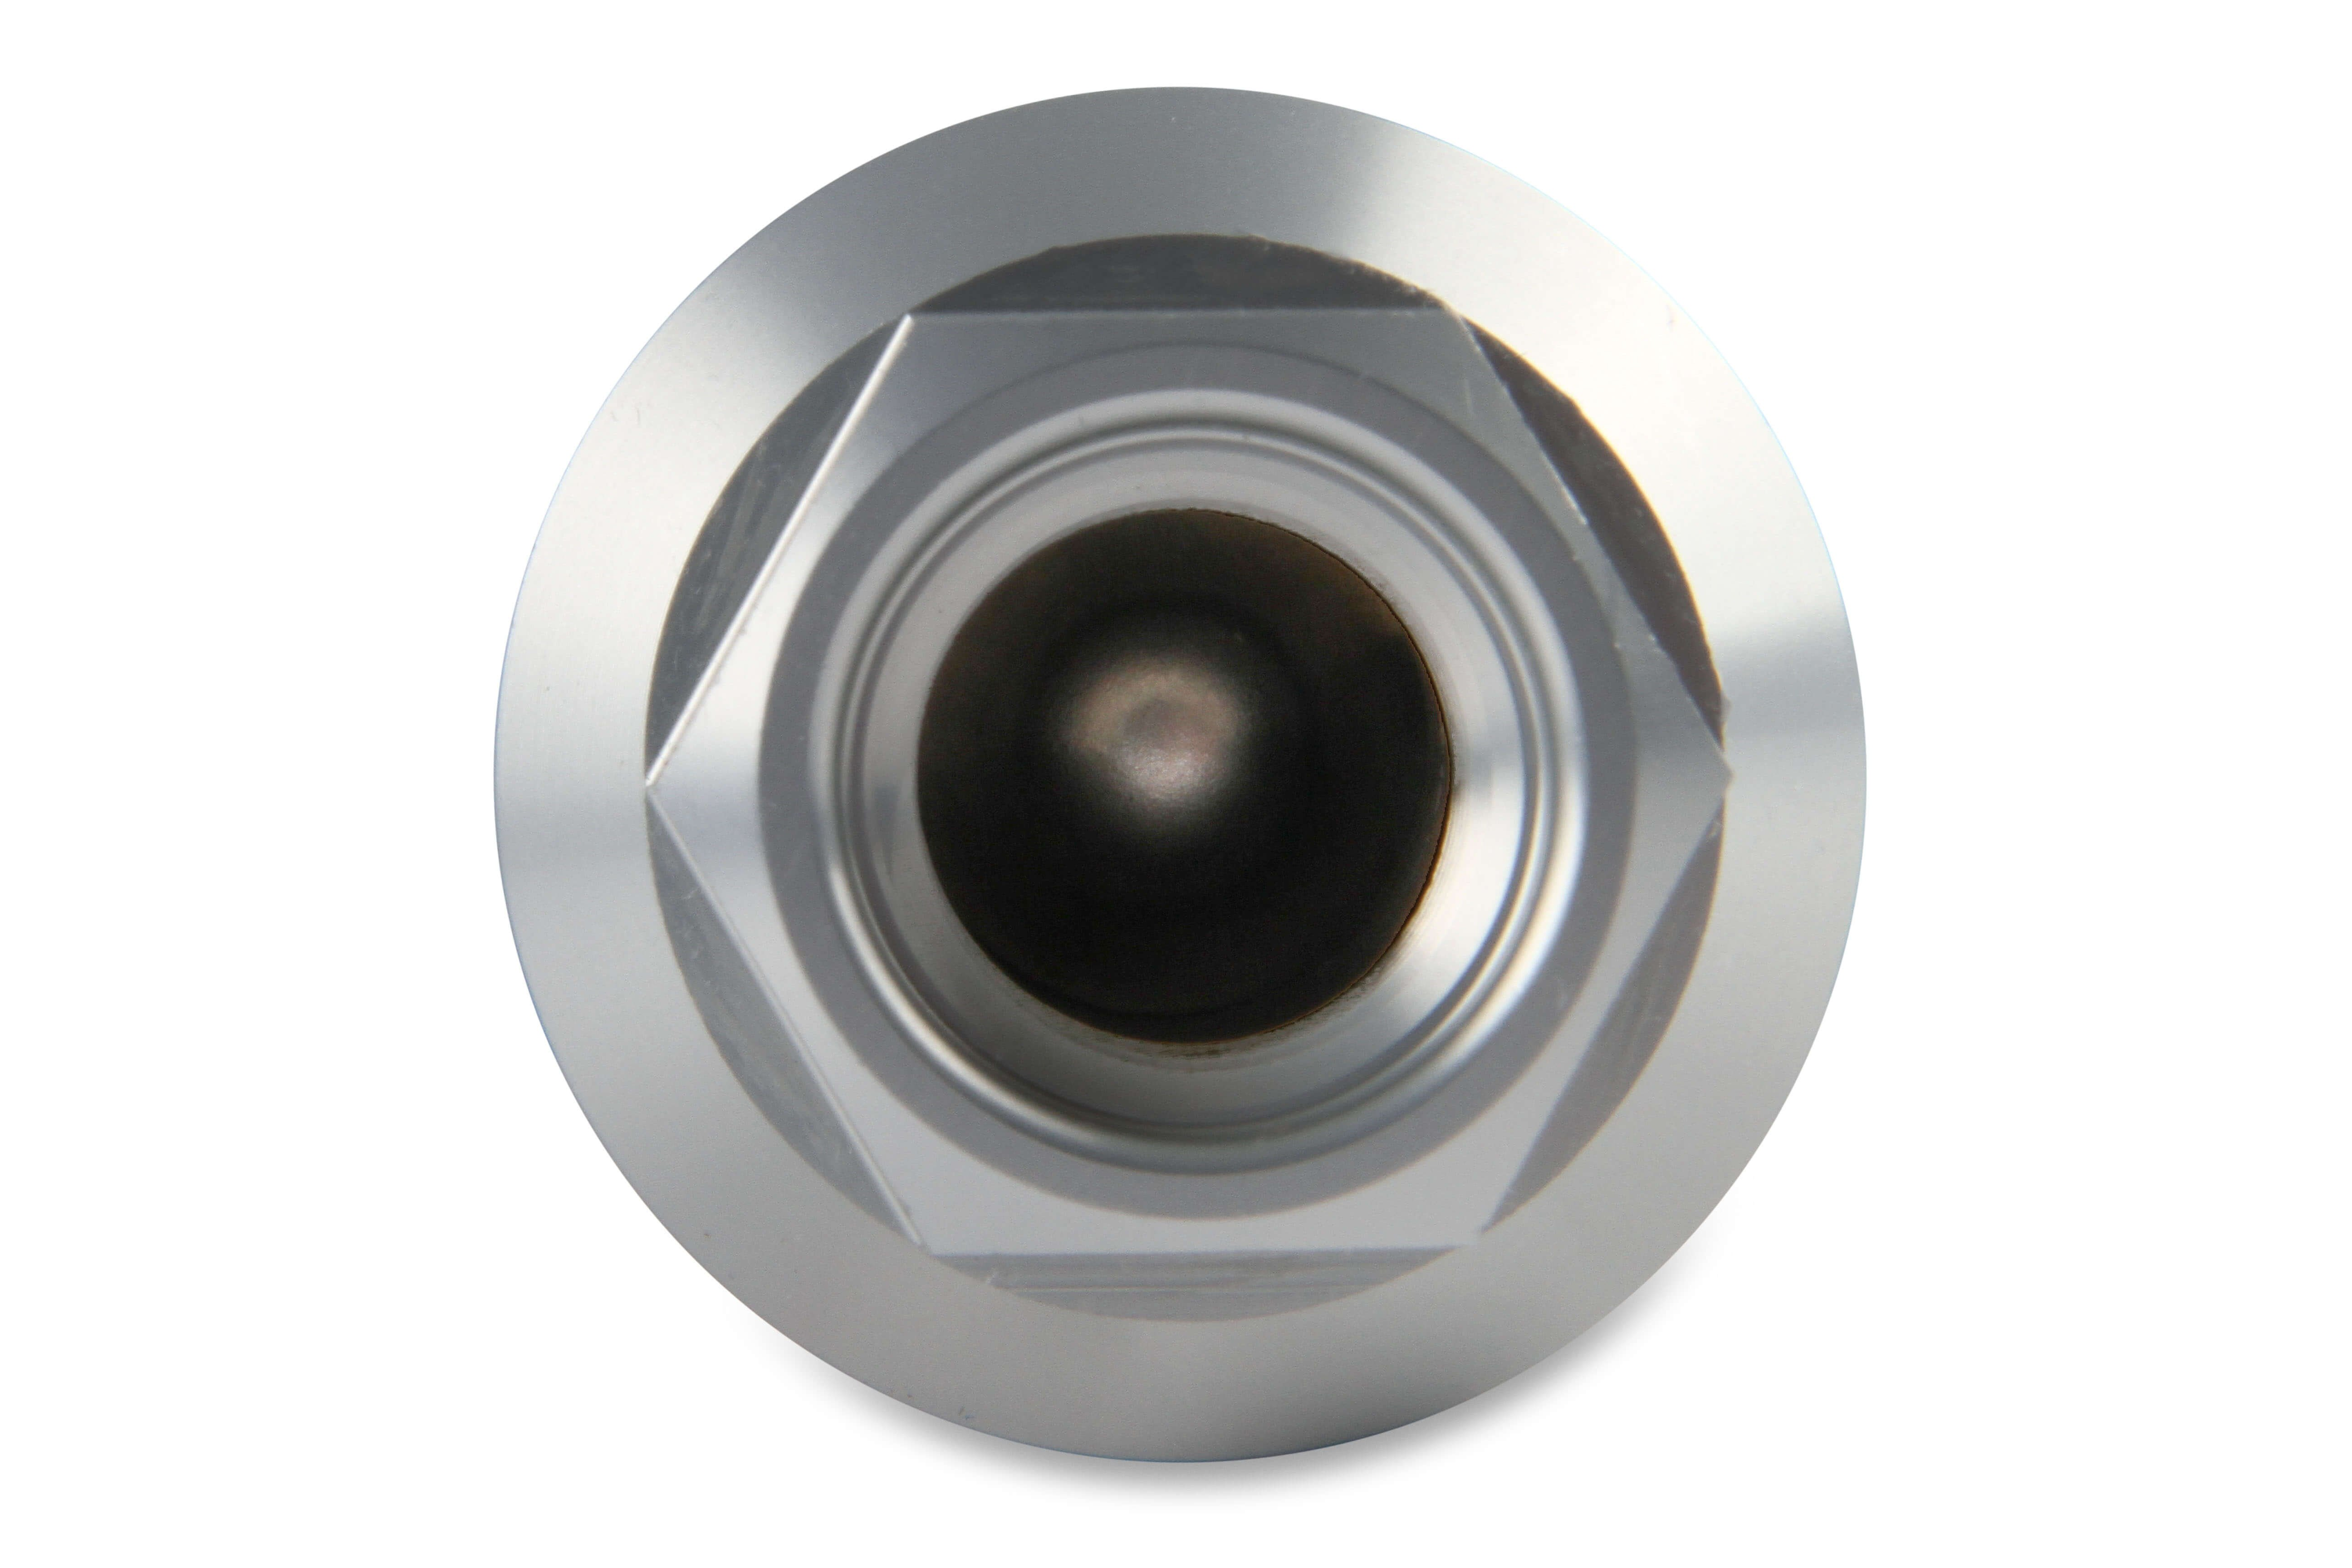 Holley Fuel Filter 10 Micron Post 162-552 175 GPH EFI 3//8 NPT